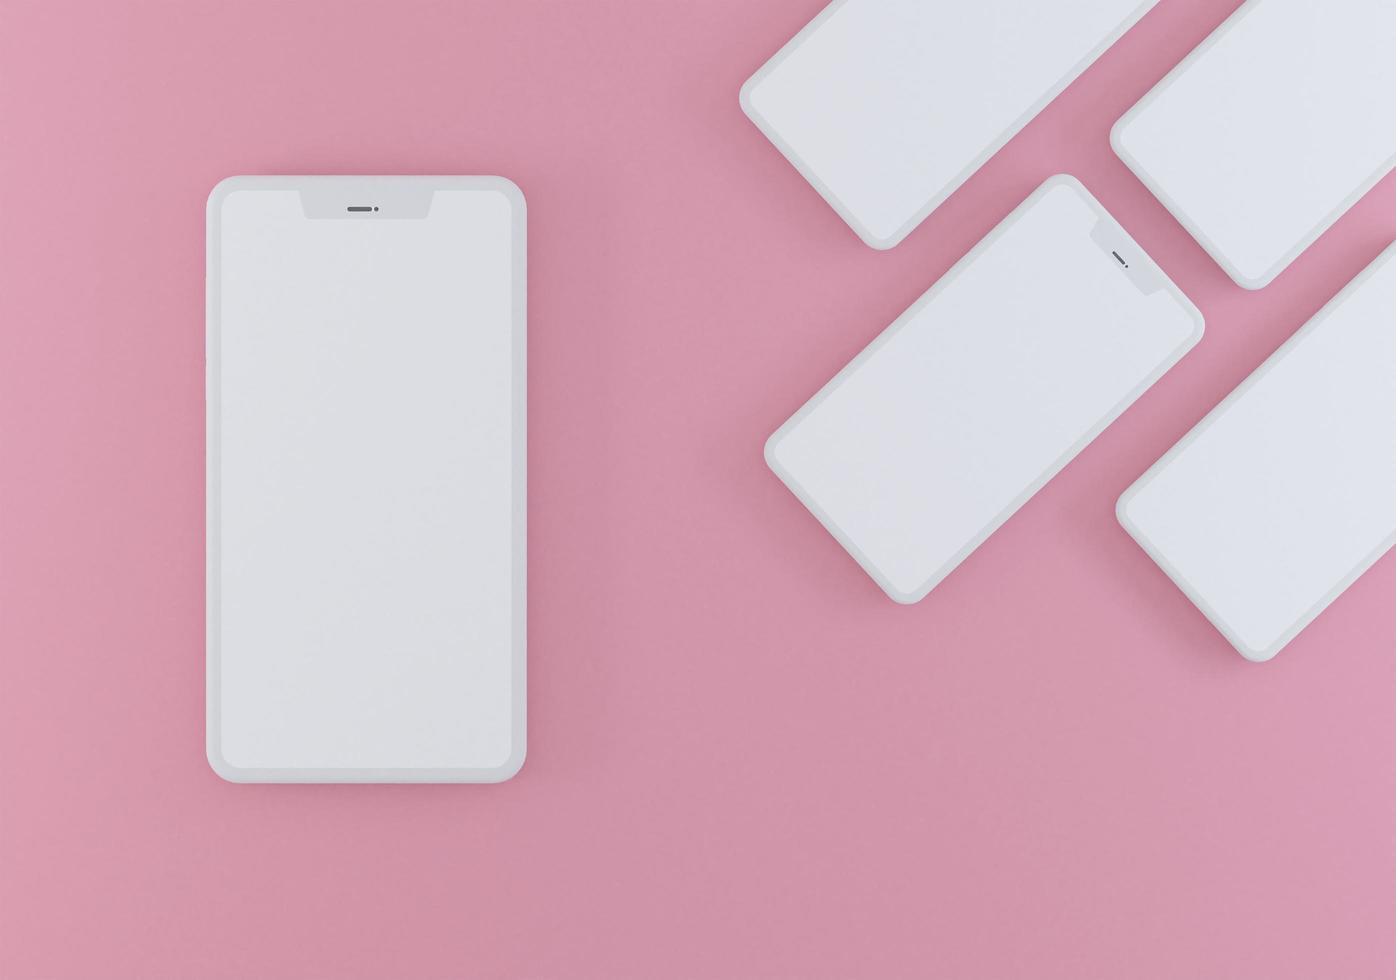 Pastellrosa 3d modernes Smartphone foto